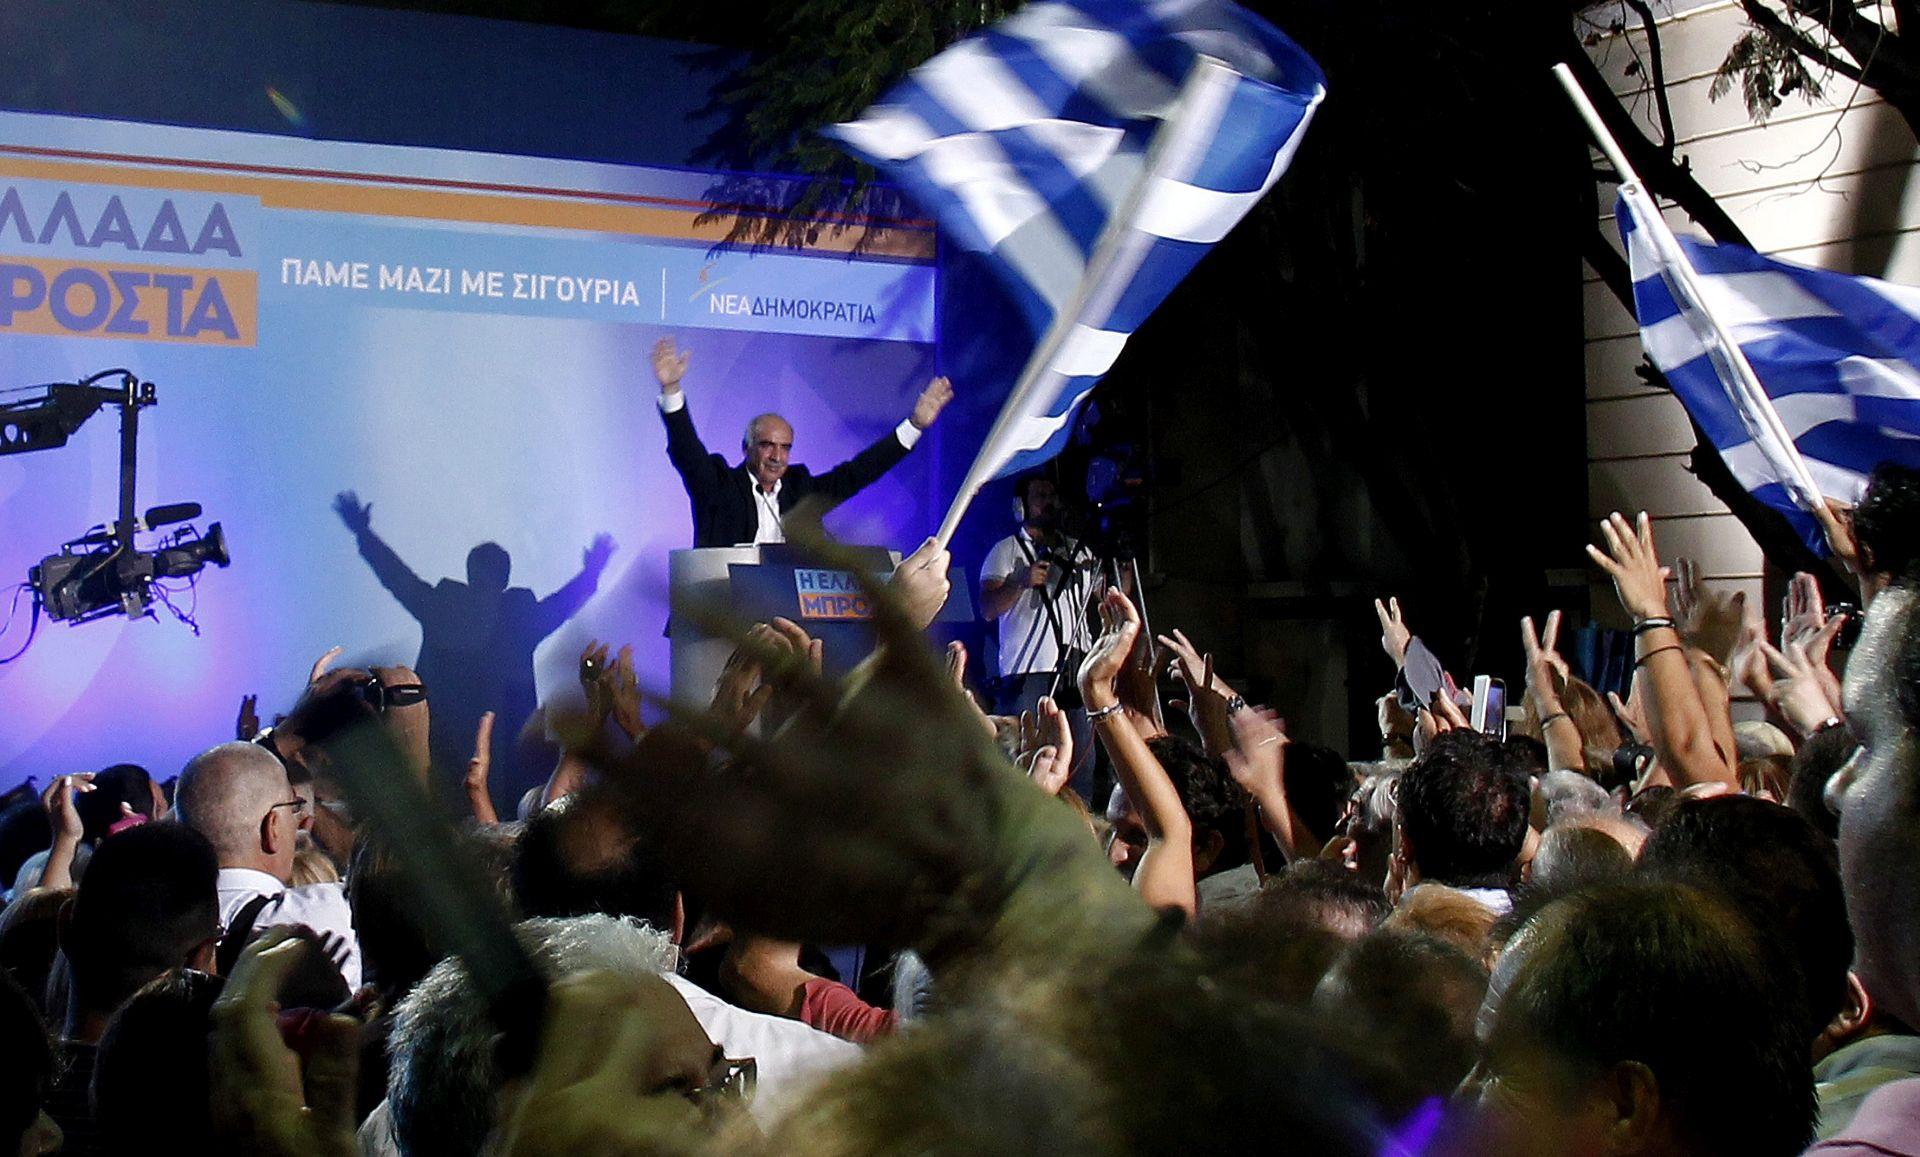 ANKETA: Desni centar u blagoj prednosti pred Syrizom